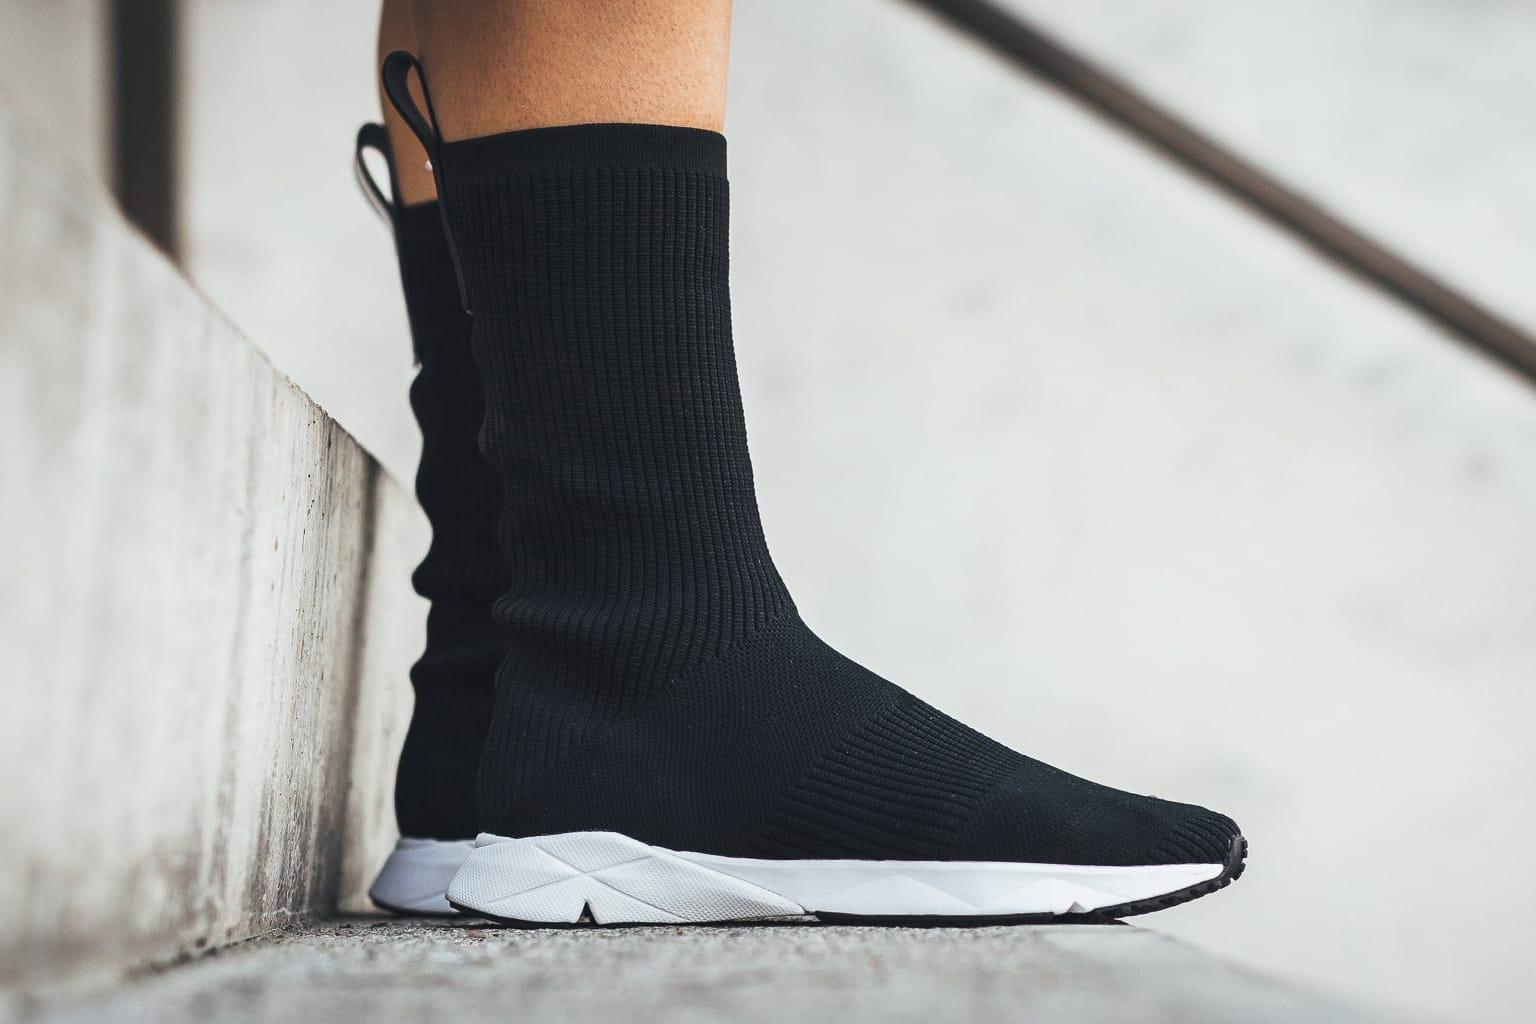 Reebok Sock Runner Ultraknit On Feet